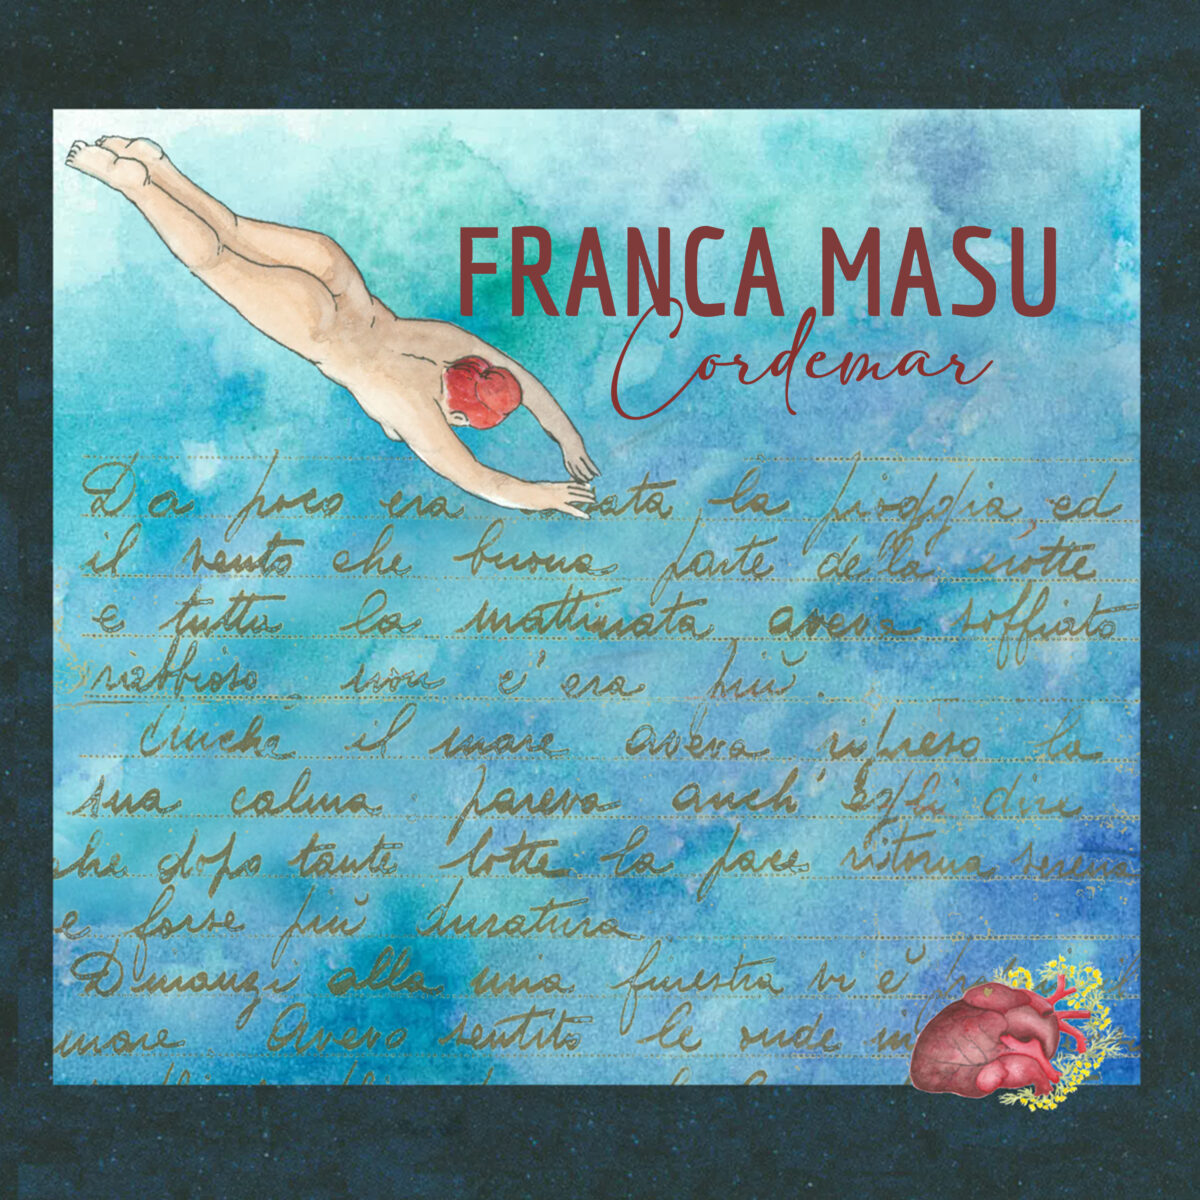 Franca Masu - Cordemar - WMusic - Alghero - 8 aprile 2021 - Spotify - ascolti - 2021 - Sa Scena - 19 aprile 2021